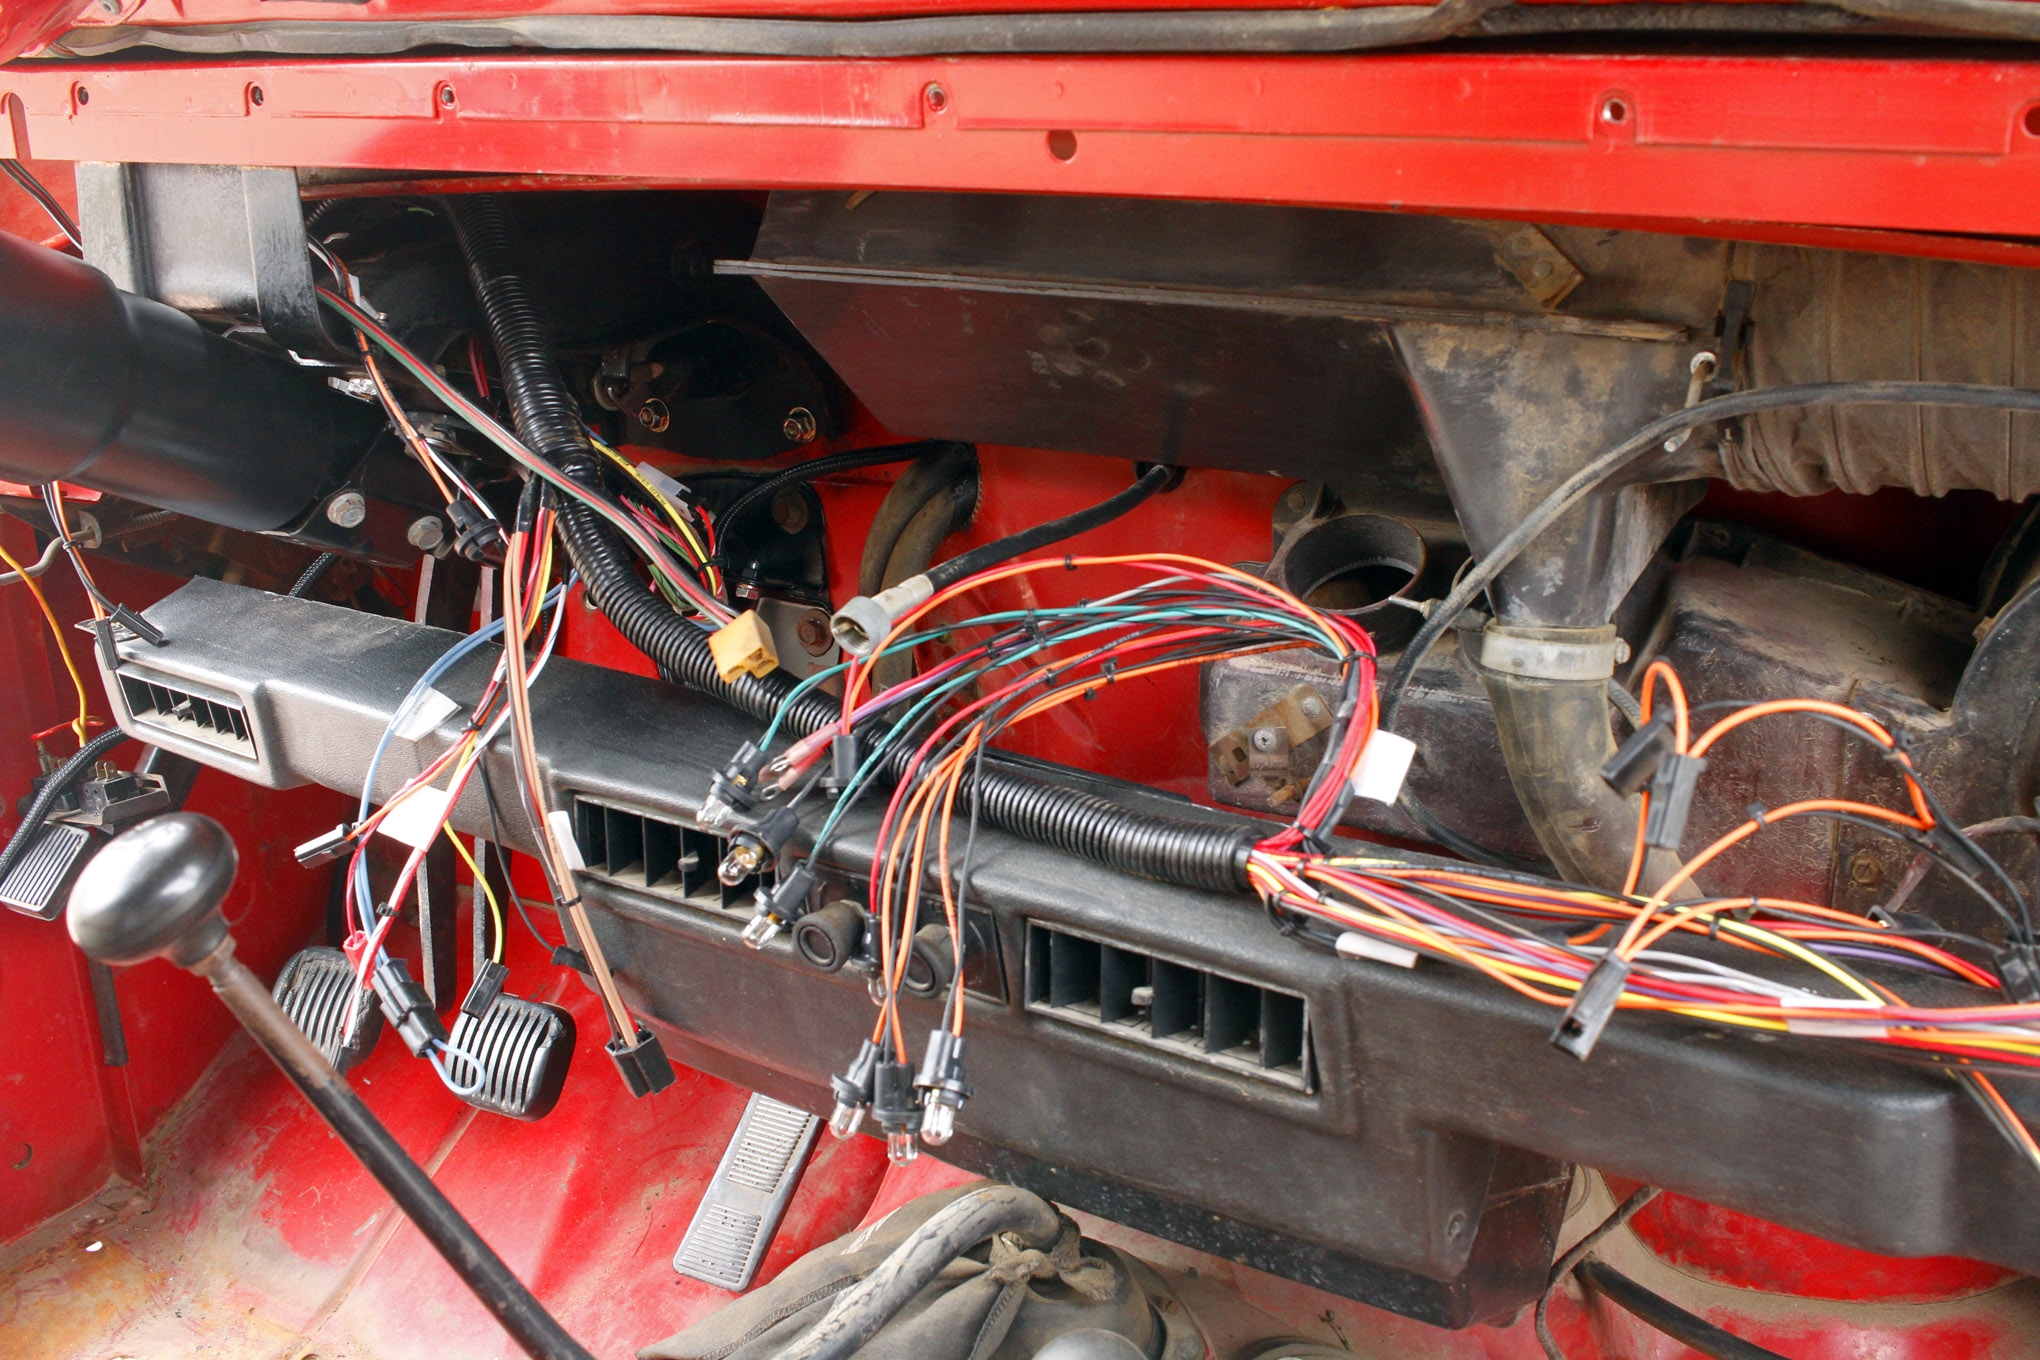 cj wiring diagram on cj wiring diagram 1952 jeep cj heater diagram  [ 2040 x 1360 Pixel ]